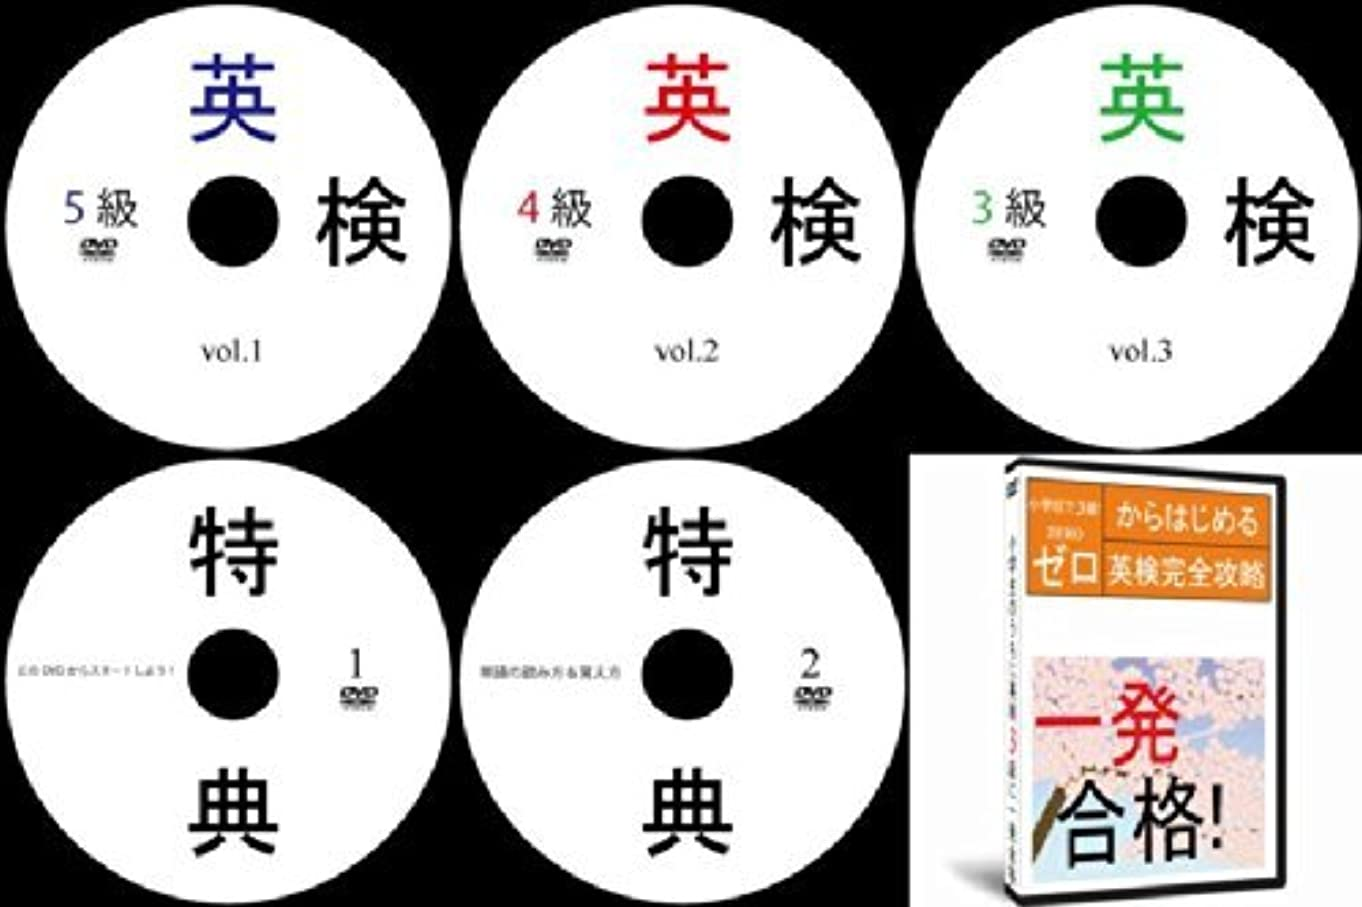 一時的人差し指ヒゲ英検3級対策DVD全5巻